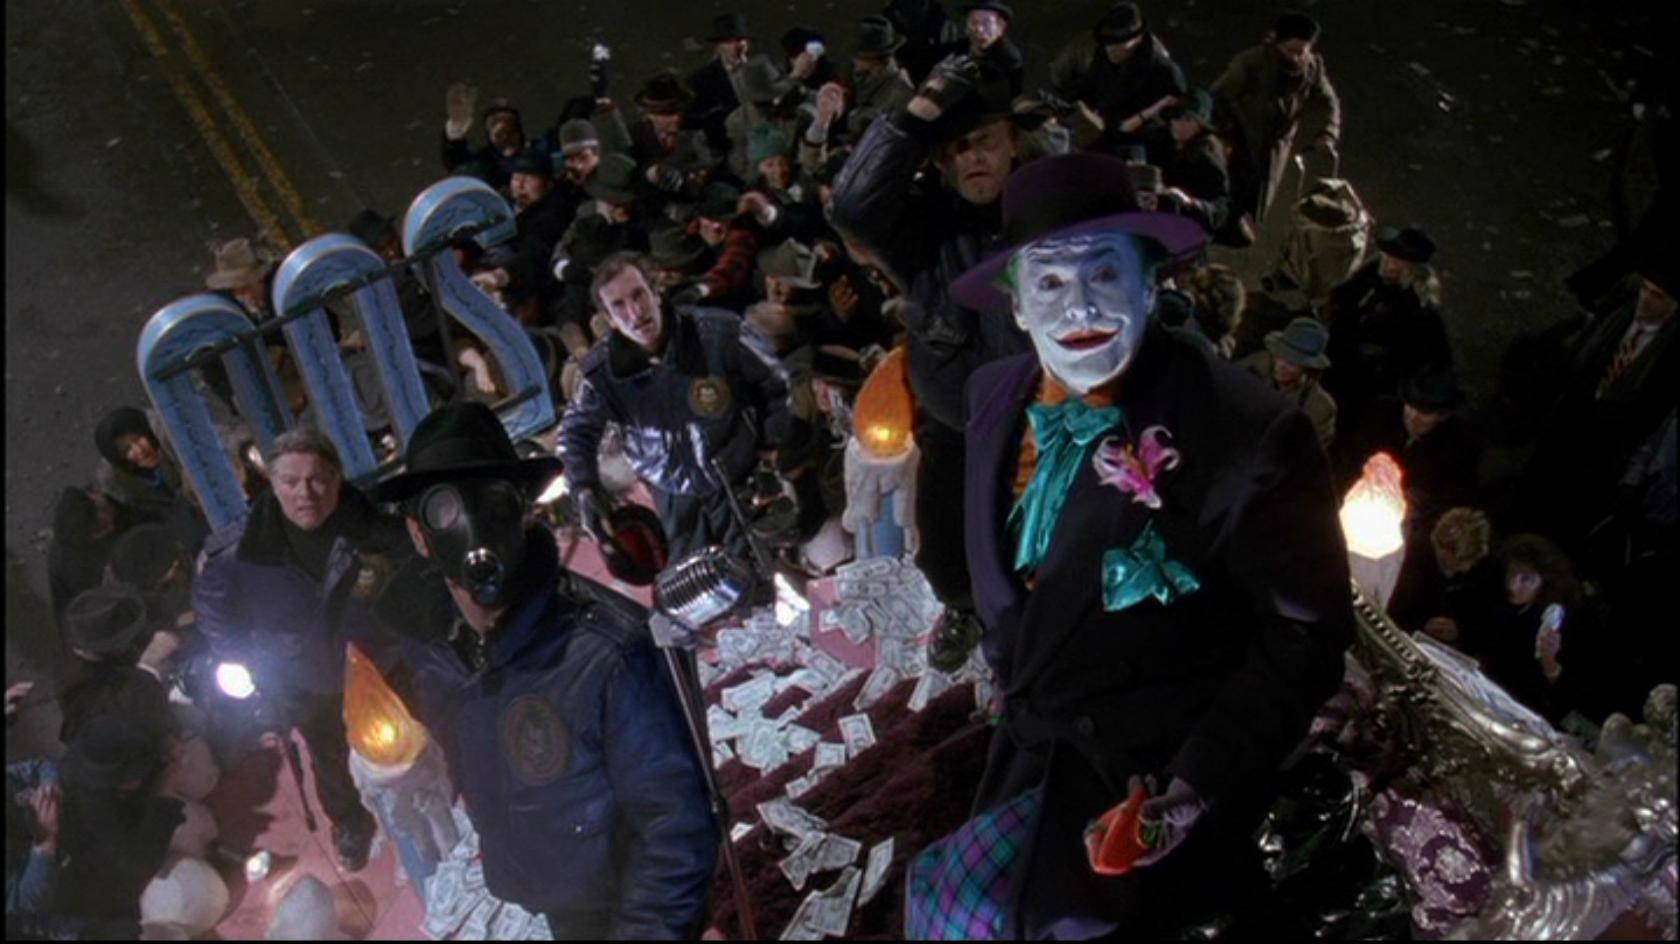 joker batman If Michael Keaton Returns to Batman, Why Not Tim Burton? Or Danny Elfman?